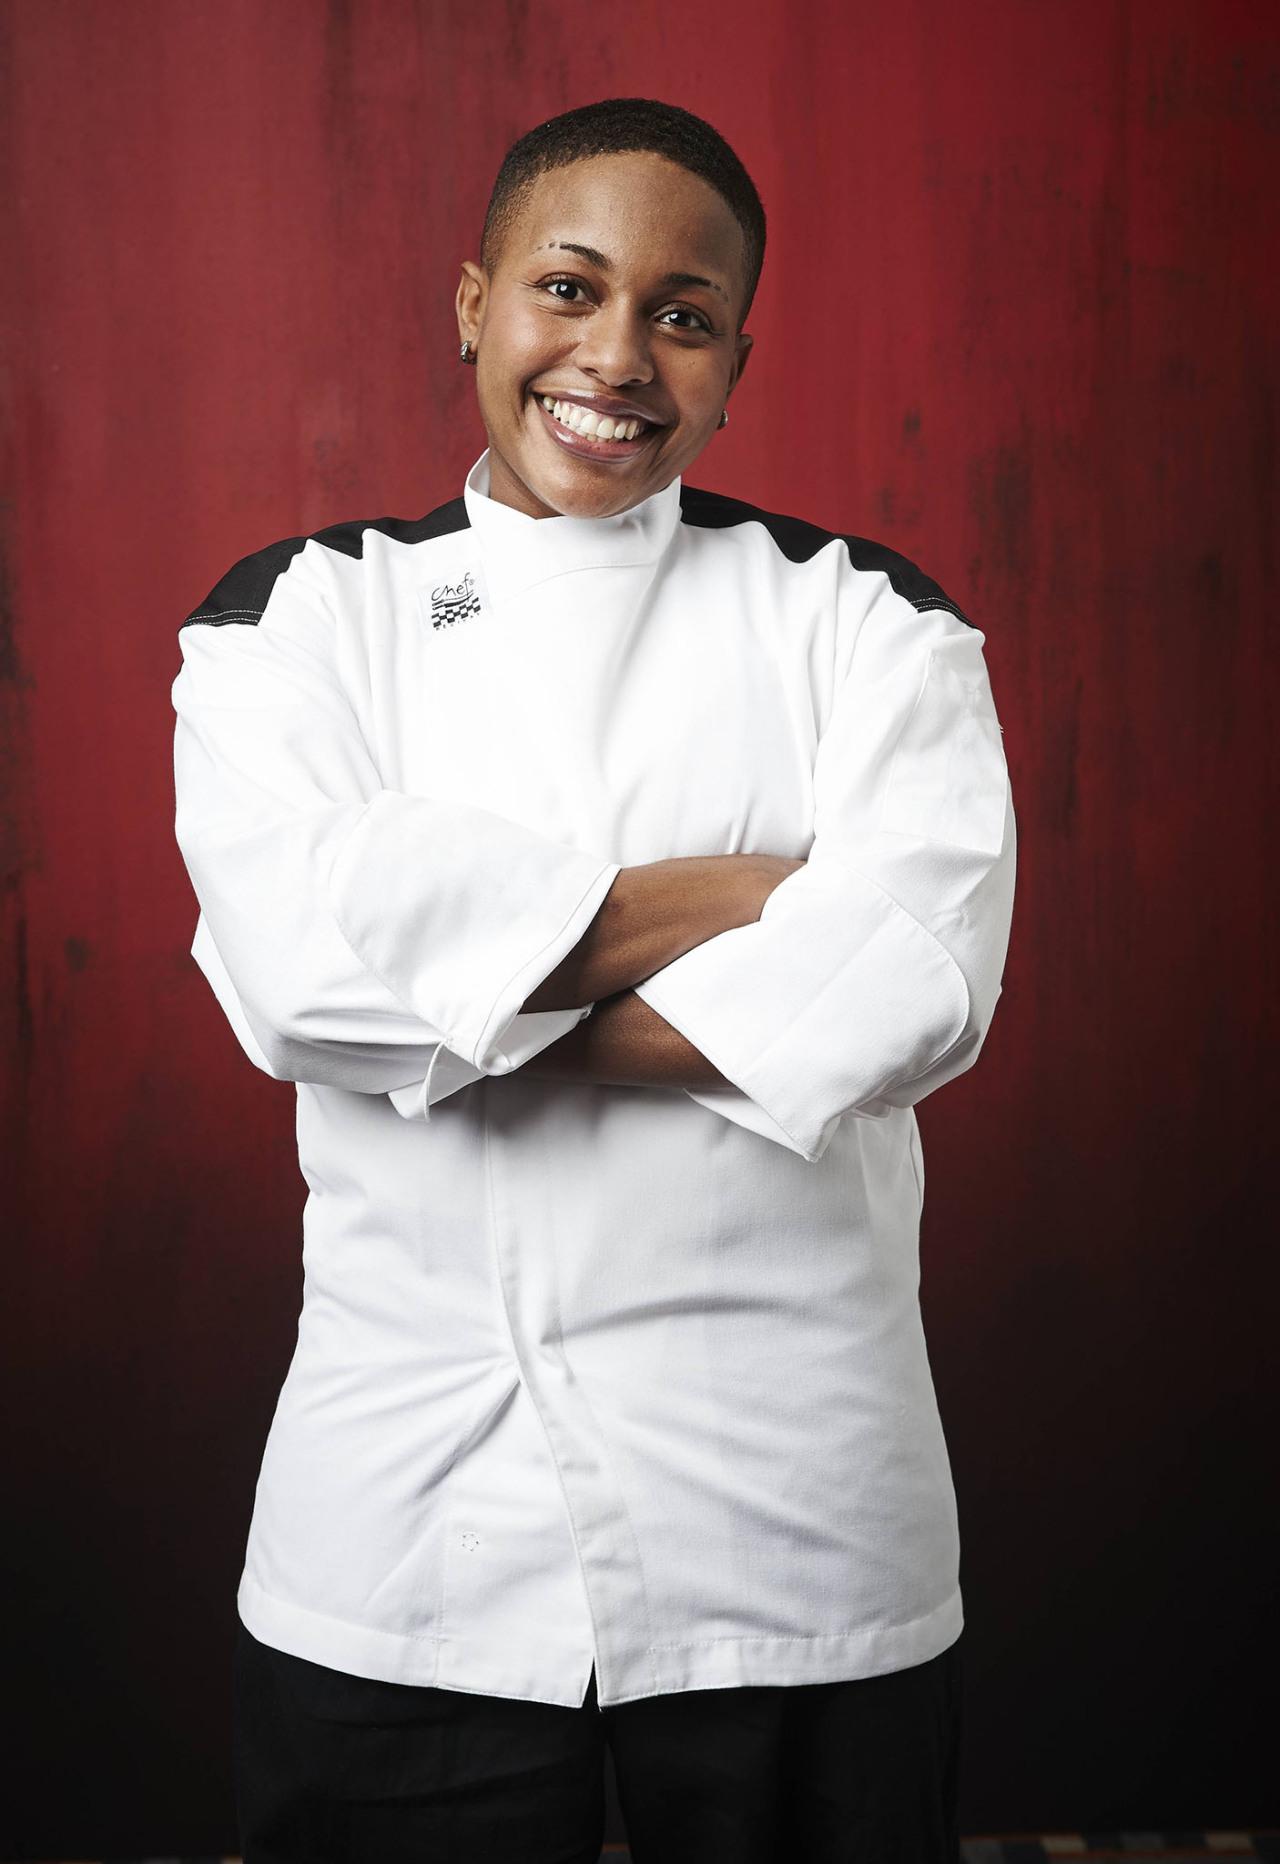 La Tasha Mccutchen Hells Kitchen Wiki Fandom Powered By